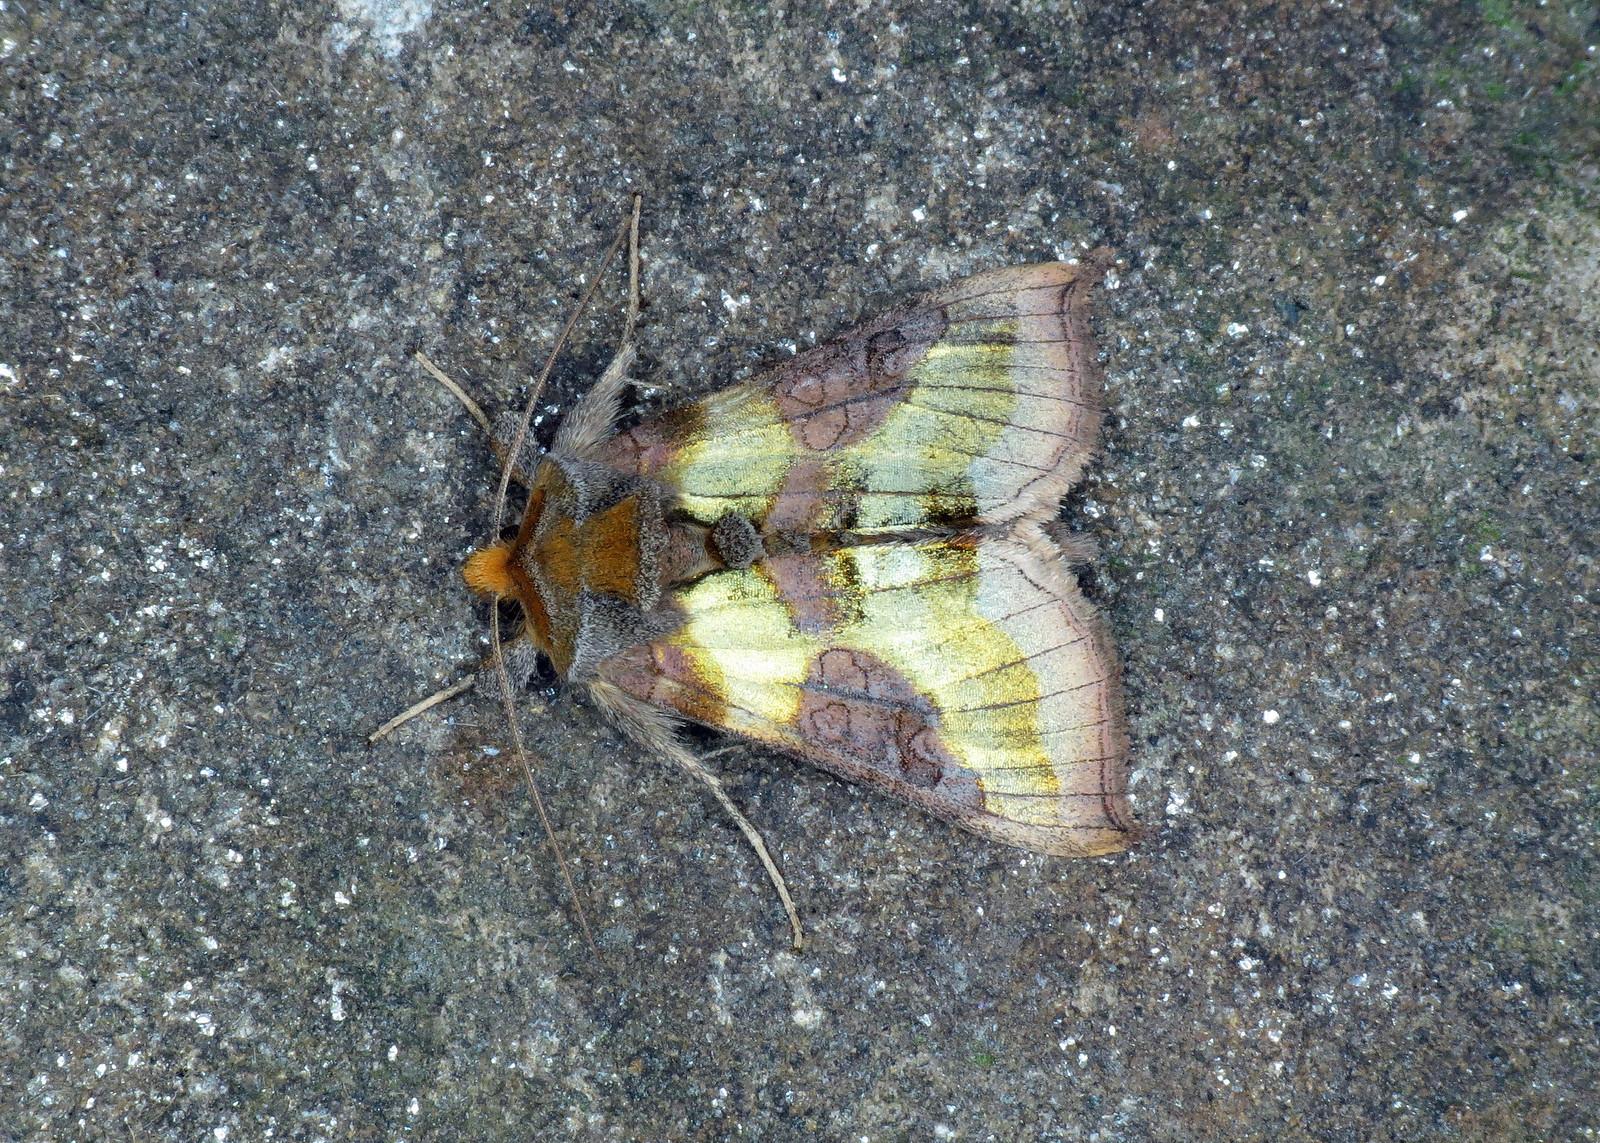 2434 Burnished Brass - Diachrysia chrysitis